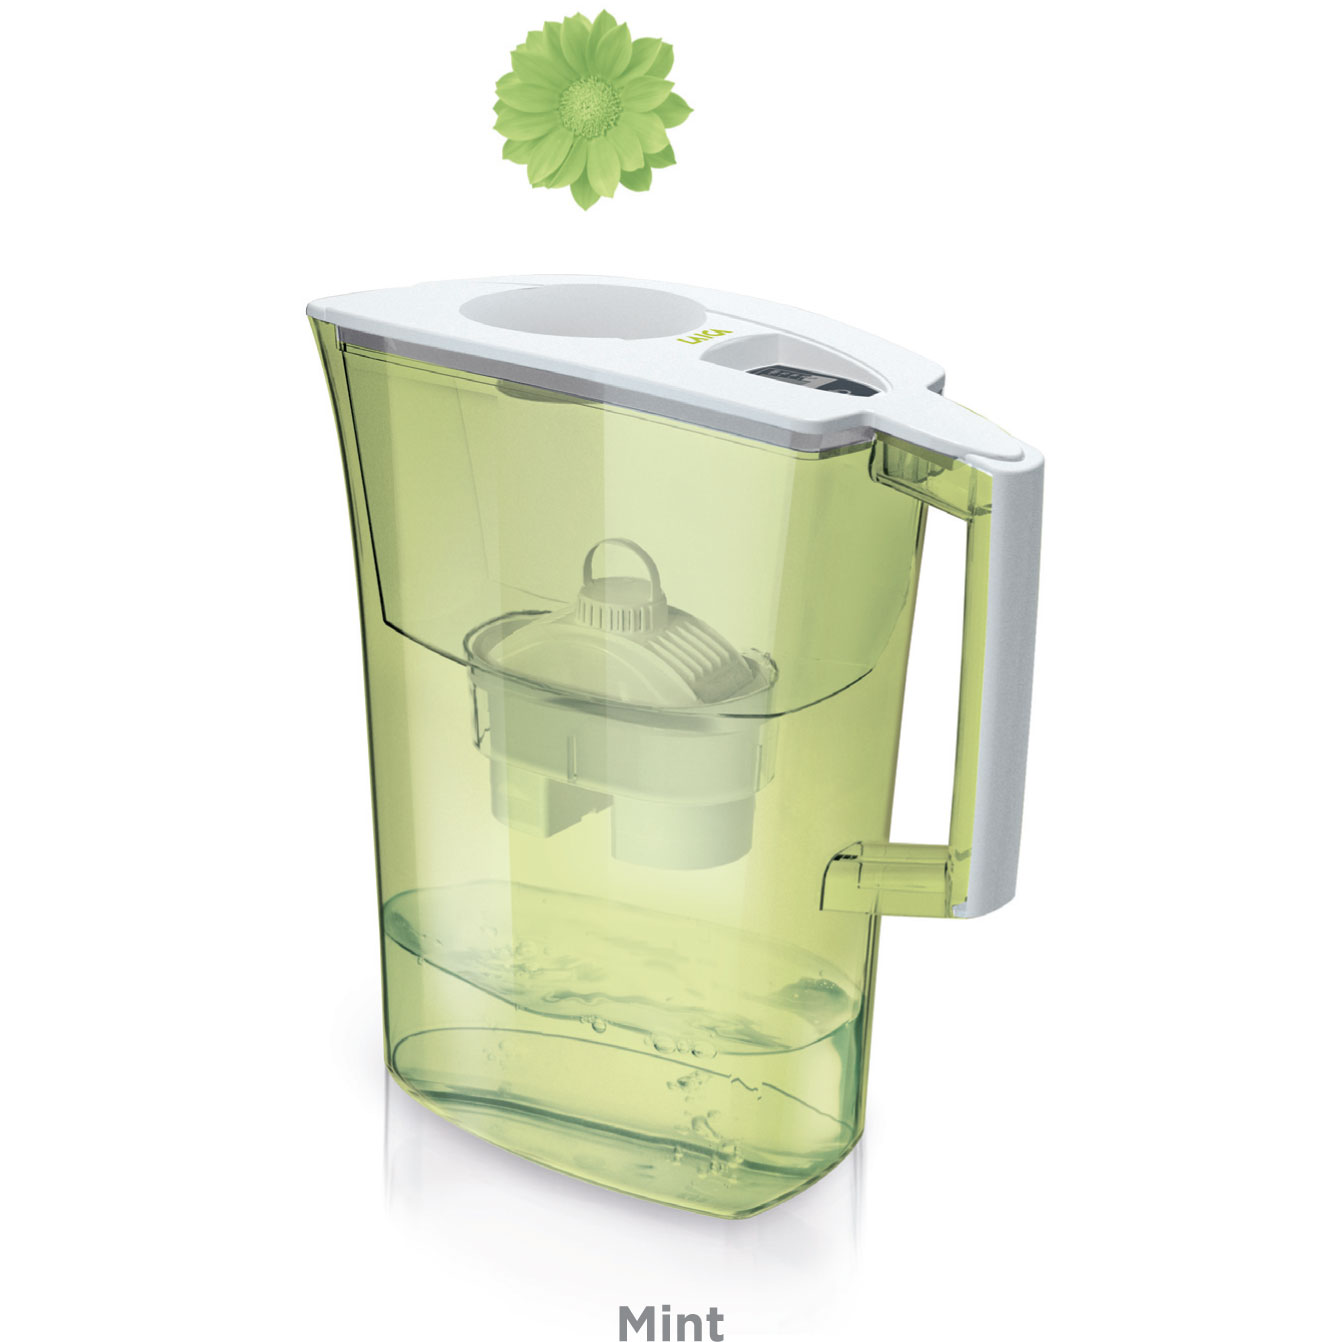 Cana filtranta de apa Laica Spring Apricot, 3 litri laicashop.ro 2021